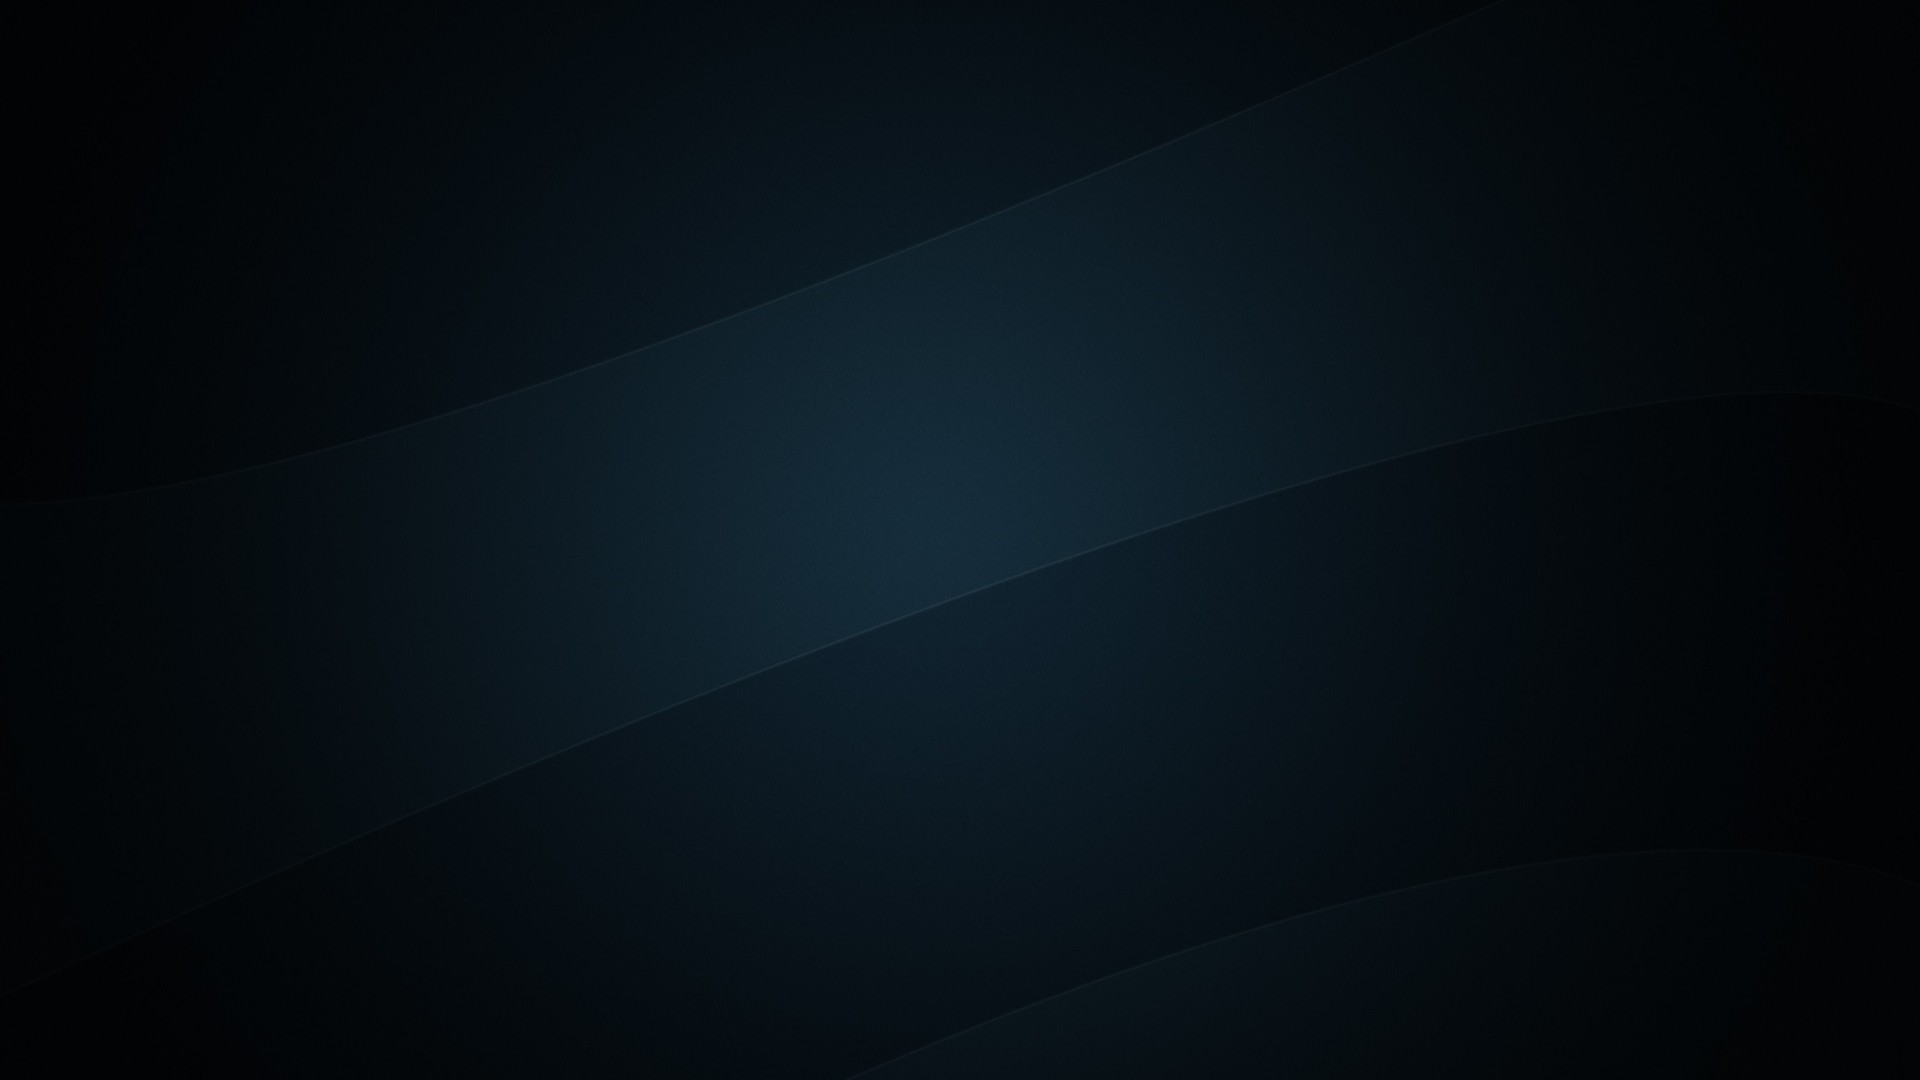 Pure Black wallpaper ·① Download free stunning HD ...